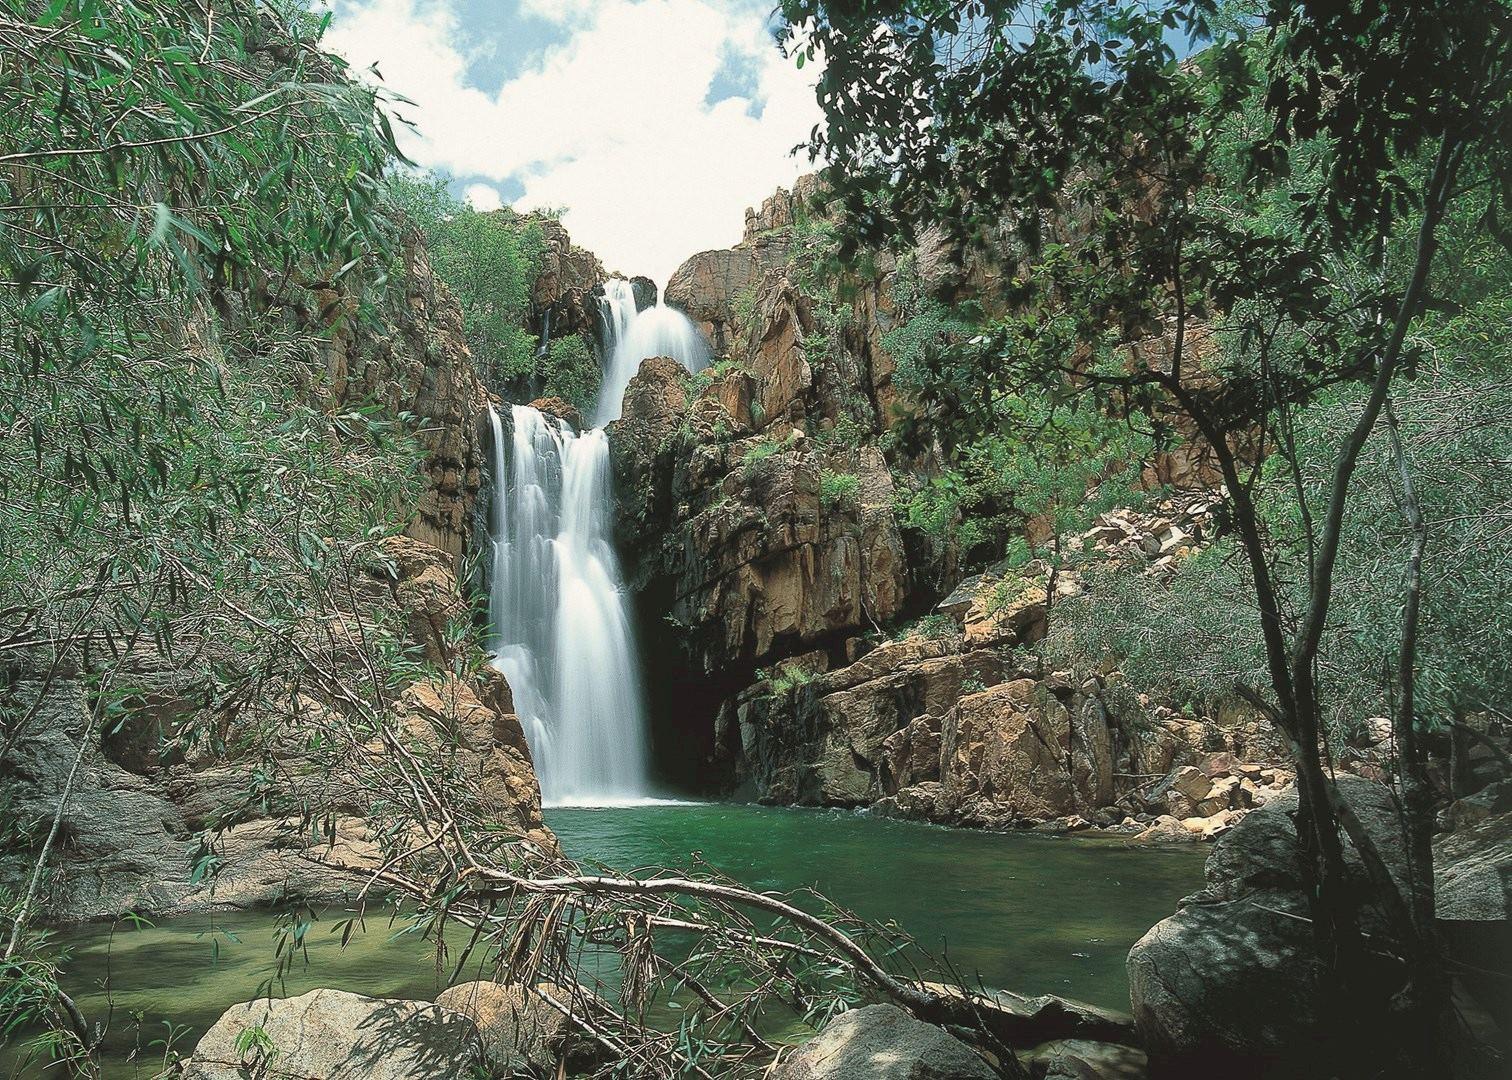 Visit Kakadu National Park in Australia | Audley Travel